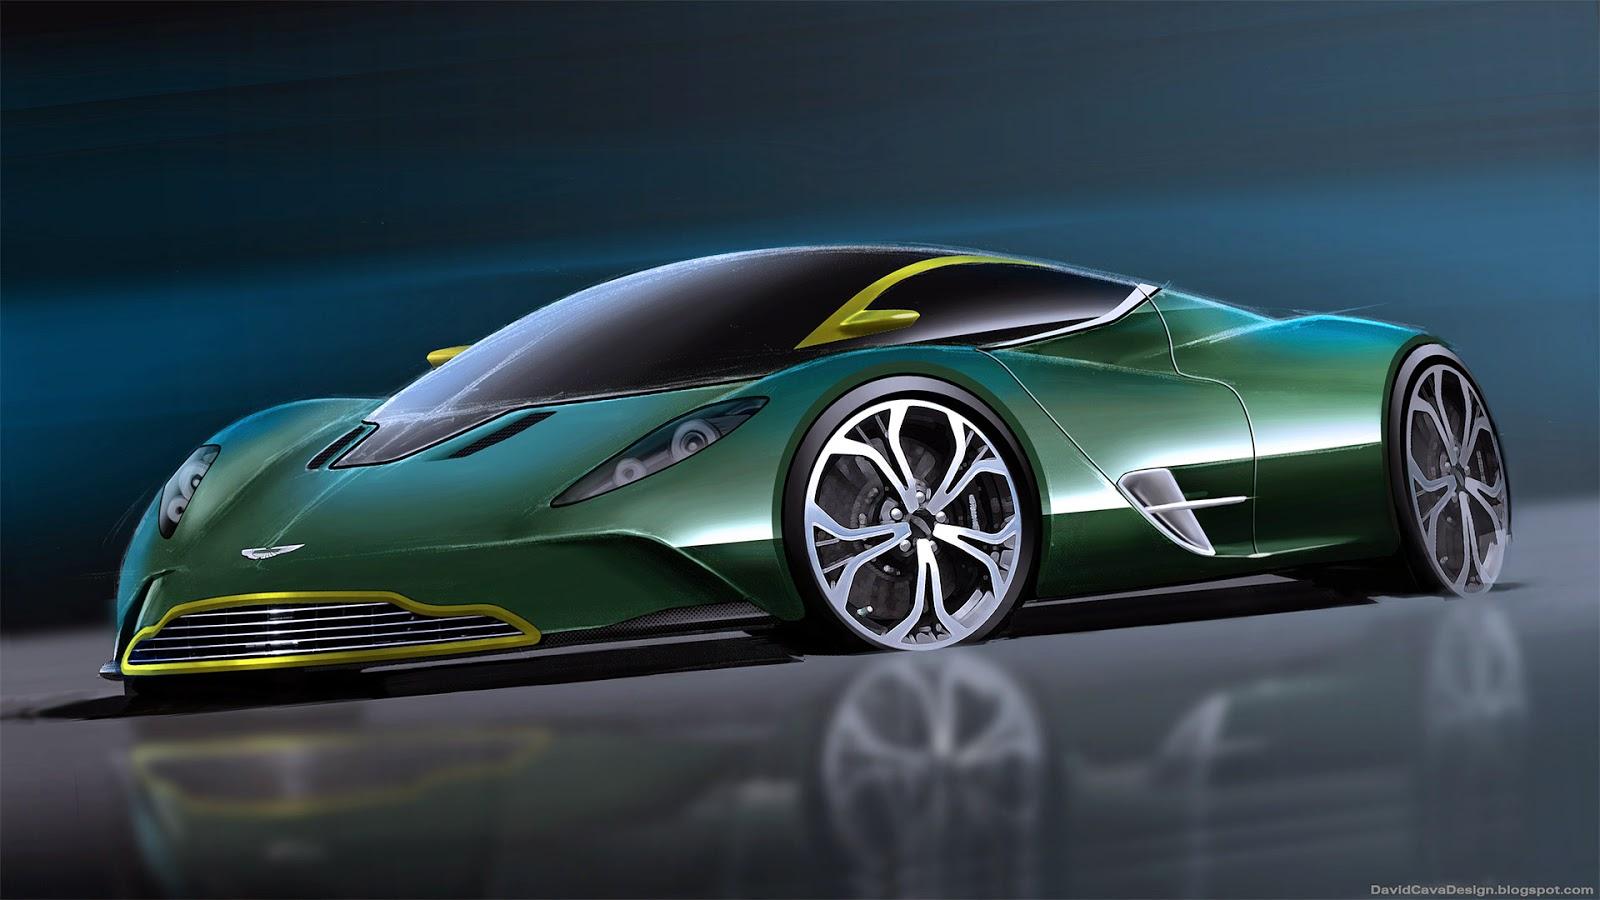 Aston Martin David Cava